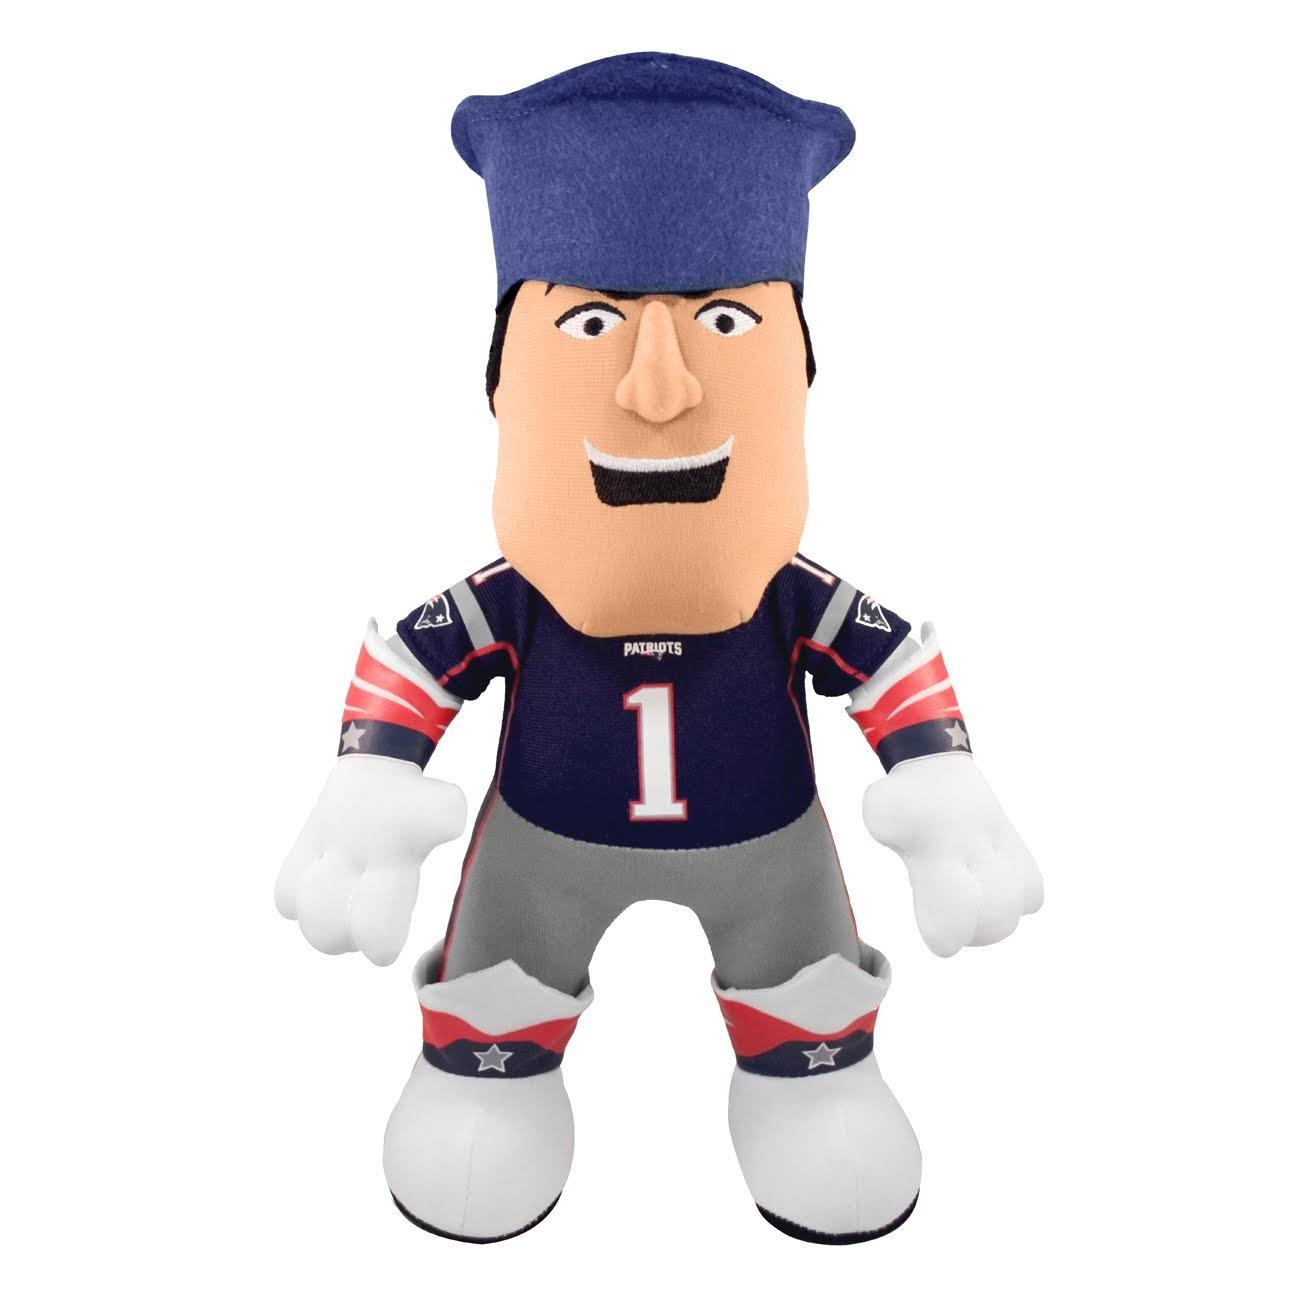 Amazon.com   Bleacher Creatures NFL New England Patriots Pat The Patriot  Mascot Plush Figure e8a893e8b26a